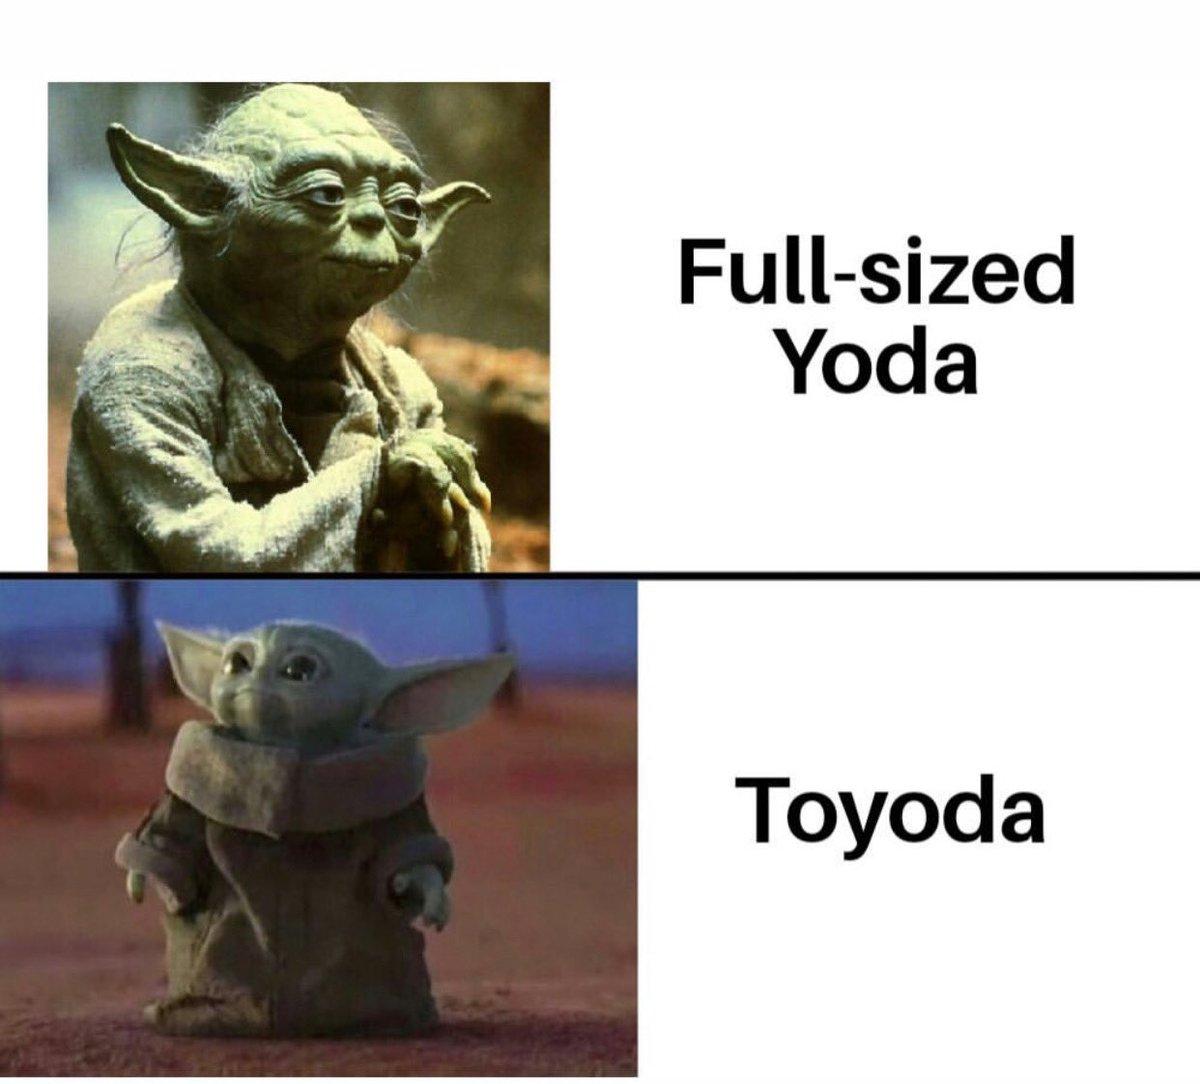 Replying to @BMS_Billy: Yoda!!!! #Yoda #babyoda #Toyoda #BMS #Billy